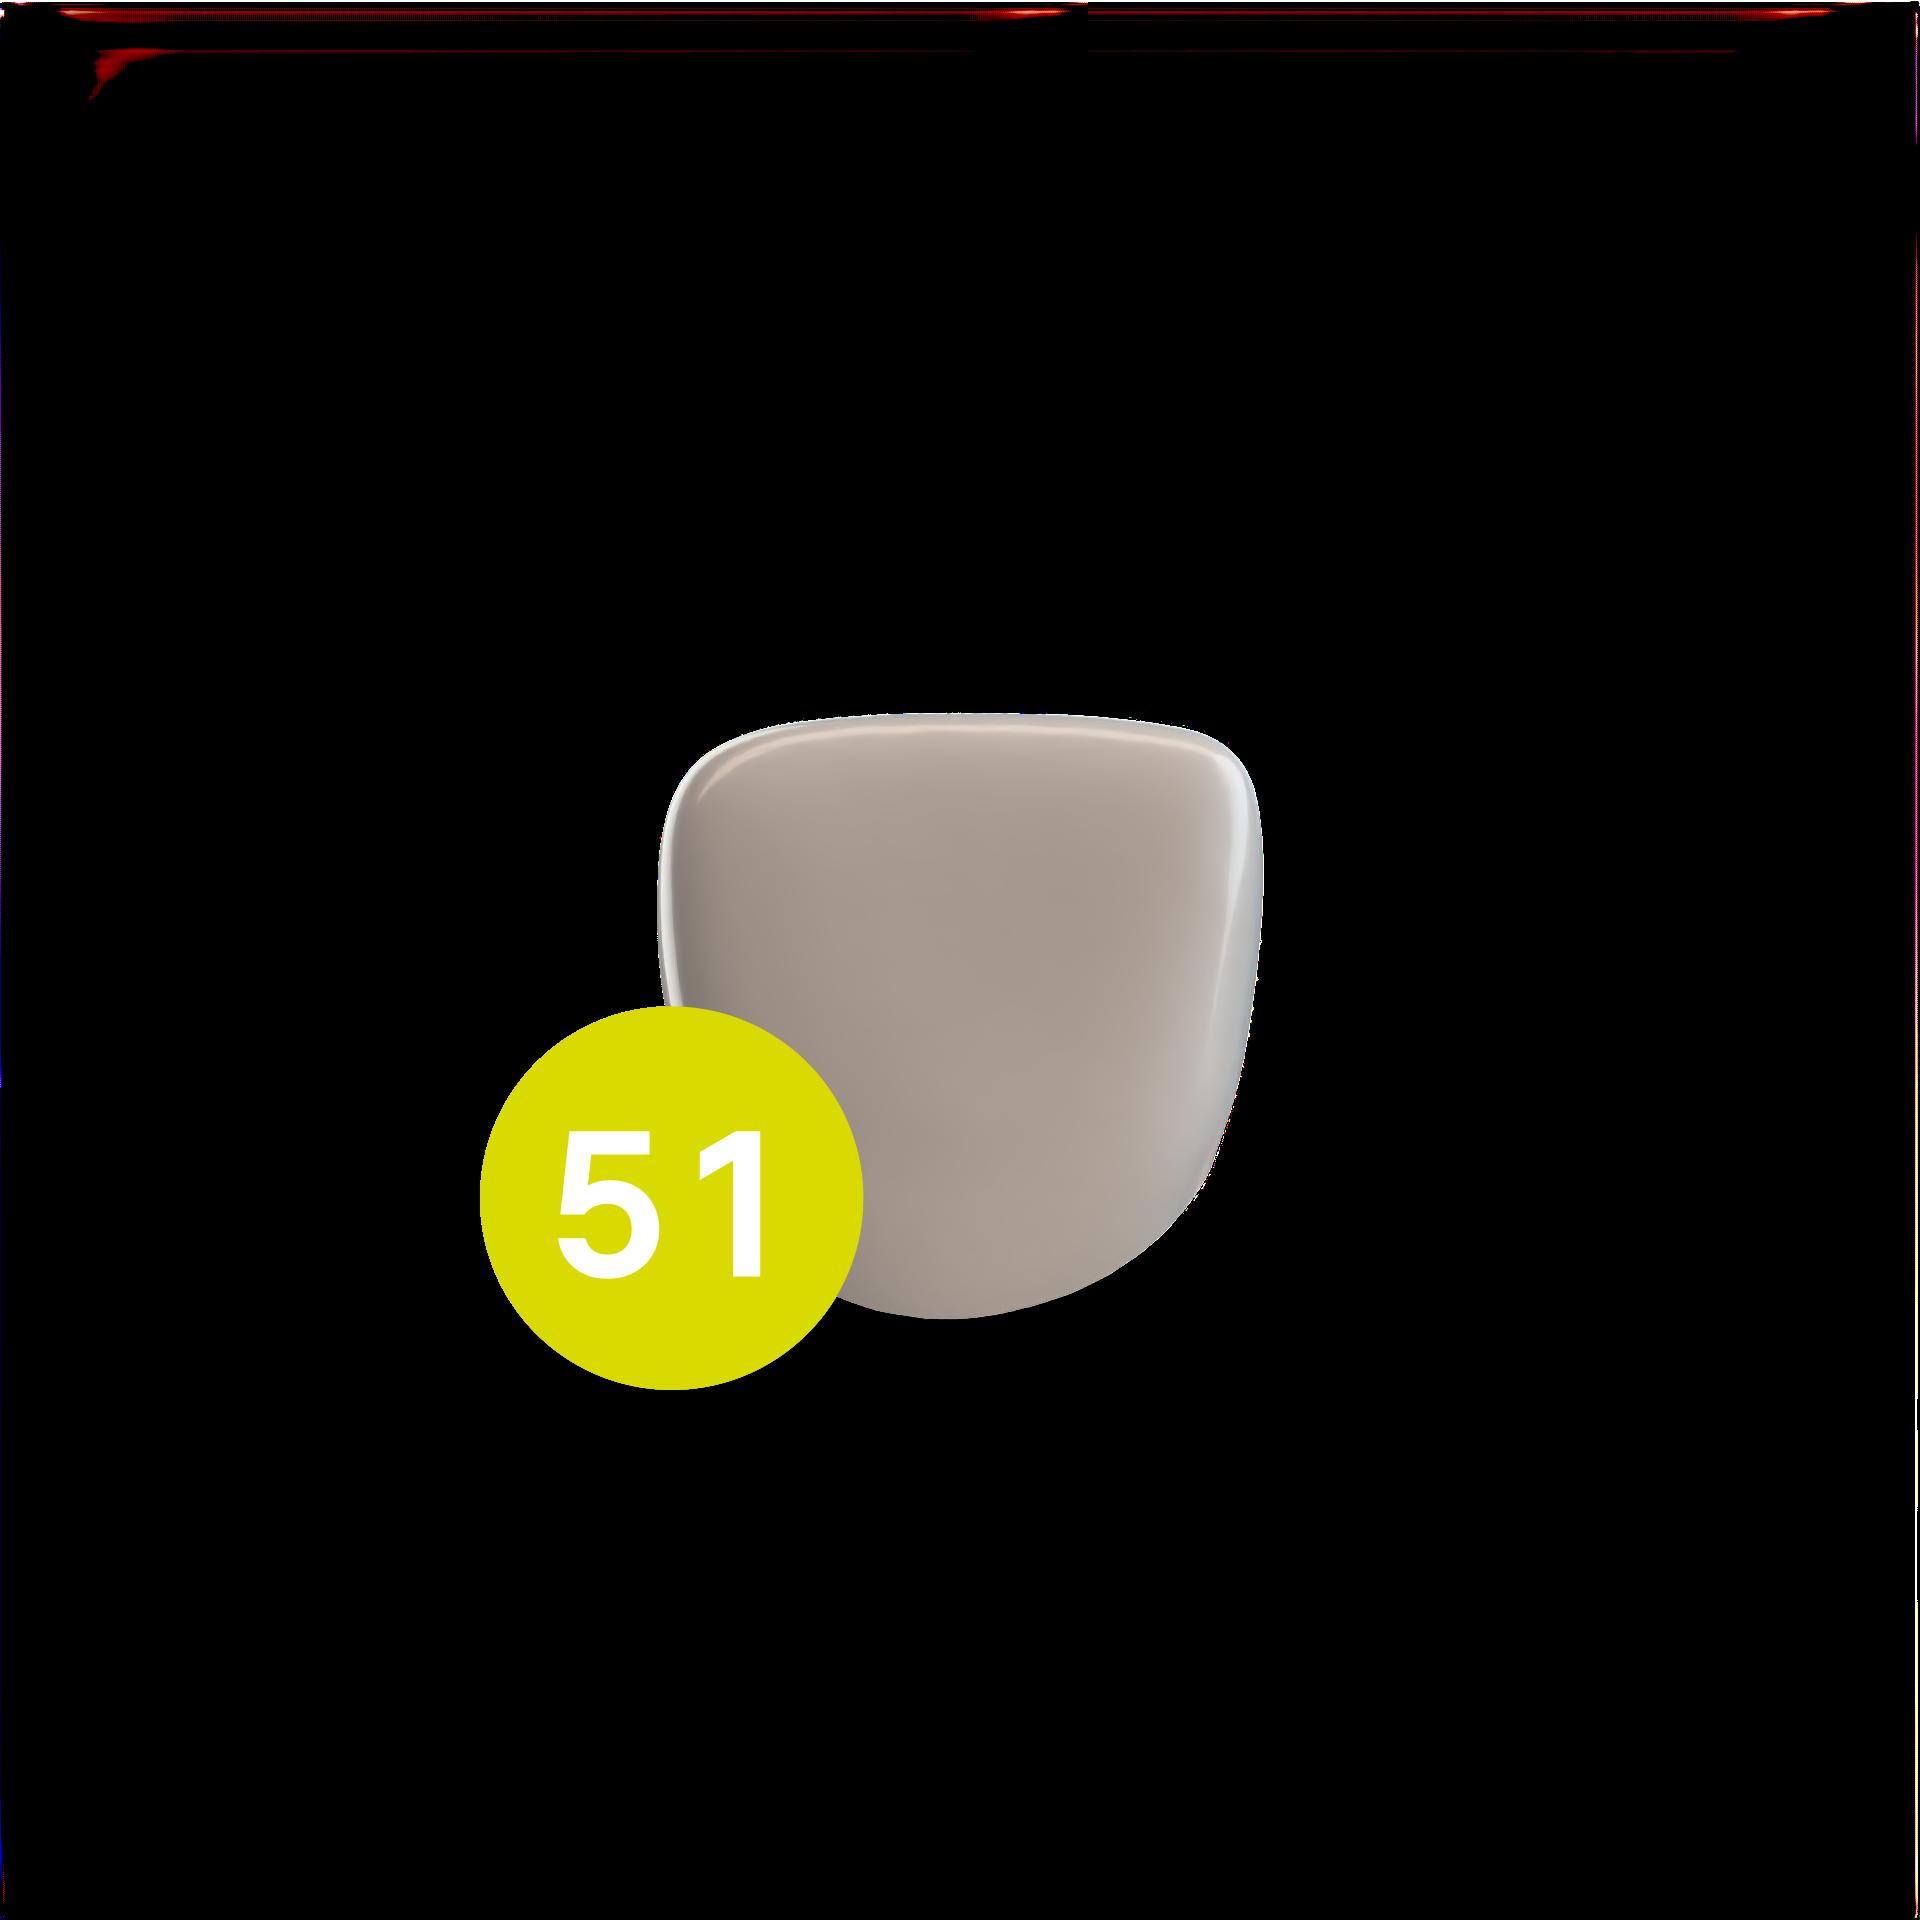 Central Incisor Upper URA (51)